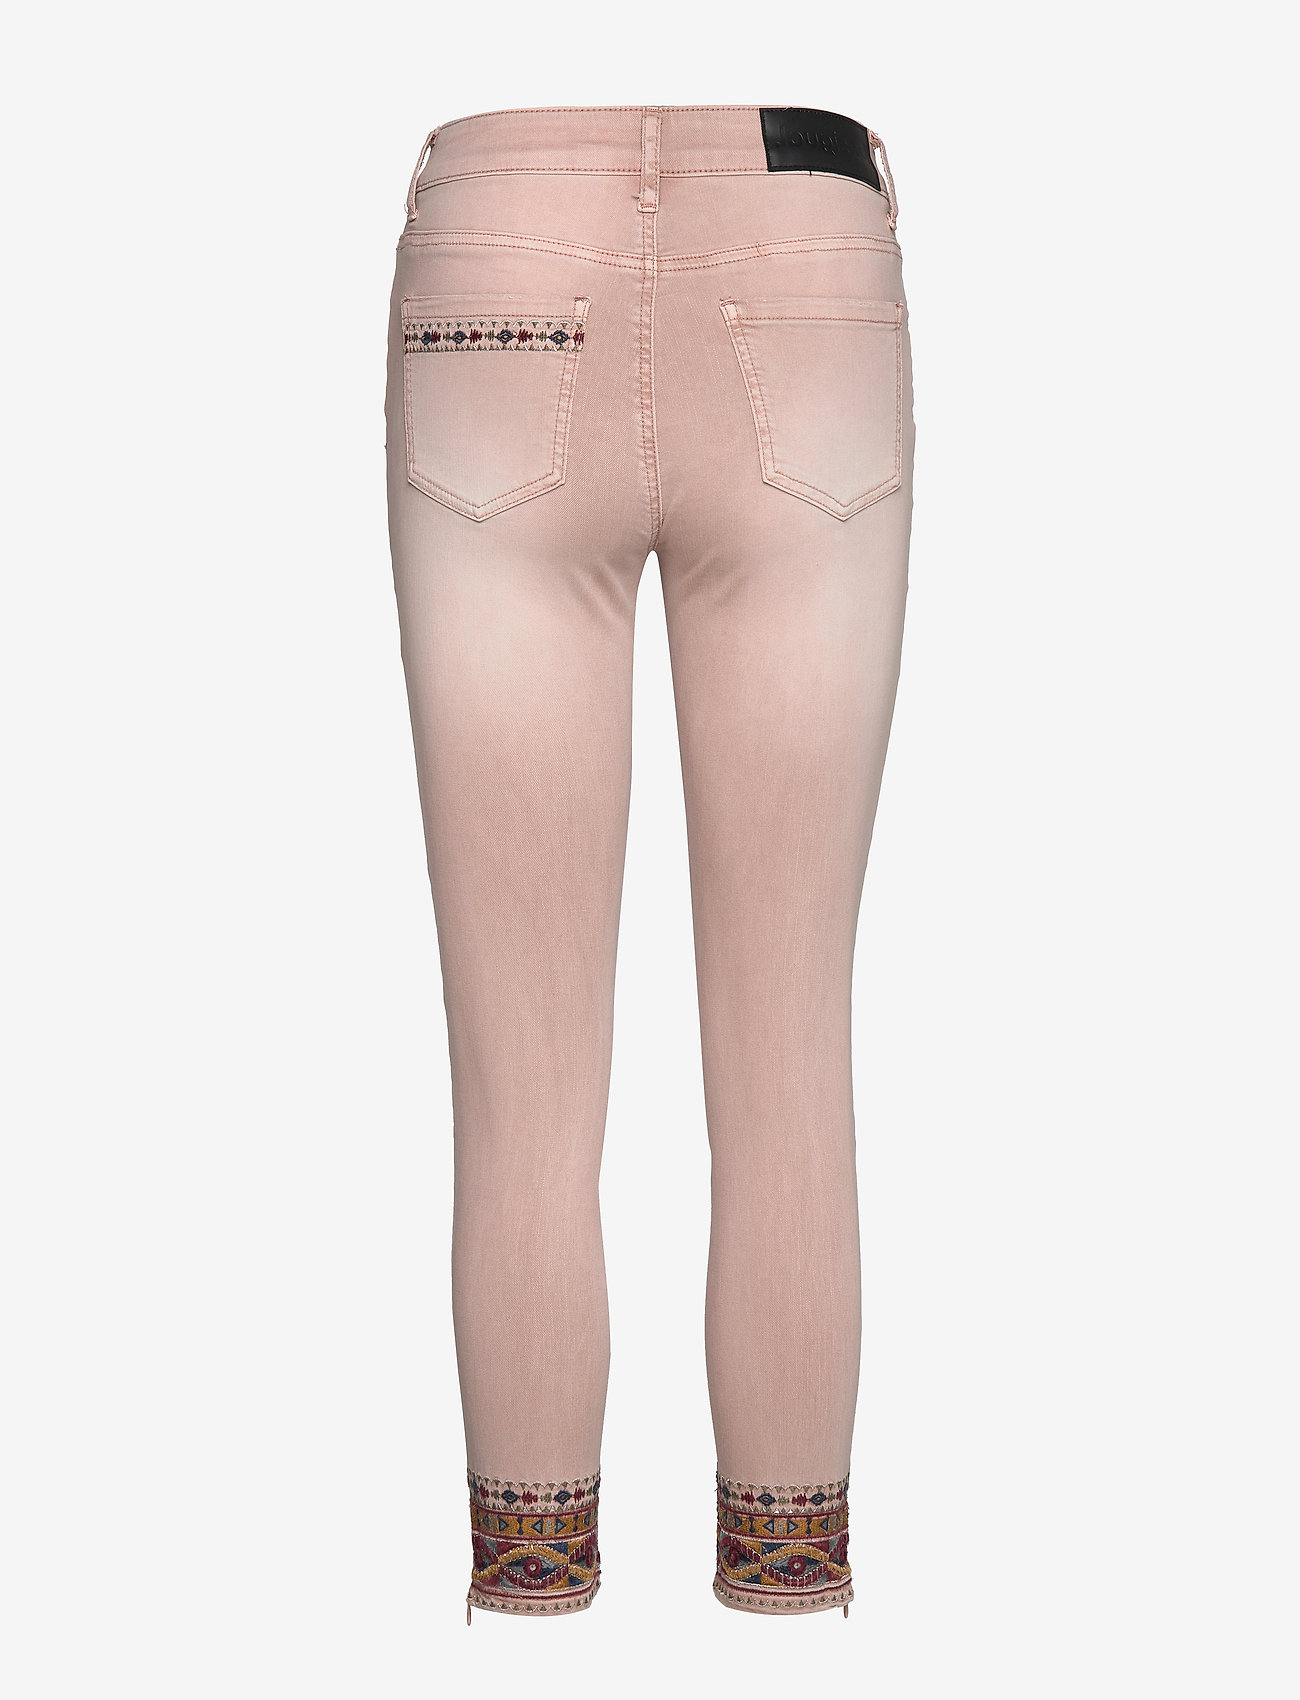 Desigual - PANT AFRI - jeans slim - rosa palo - 1